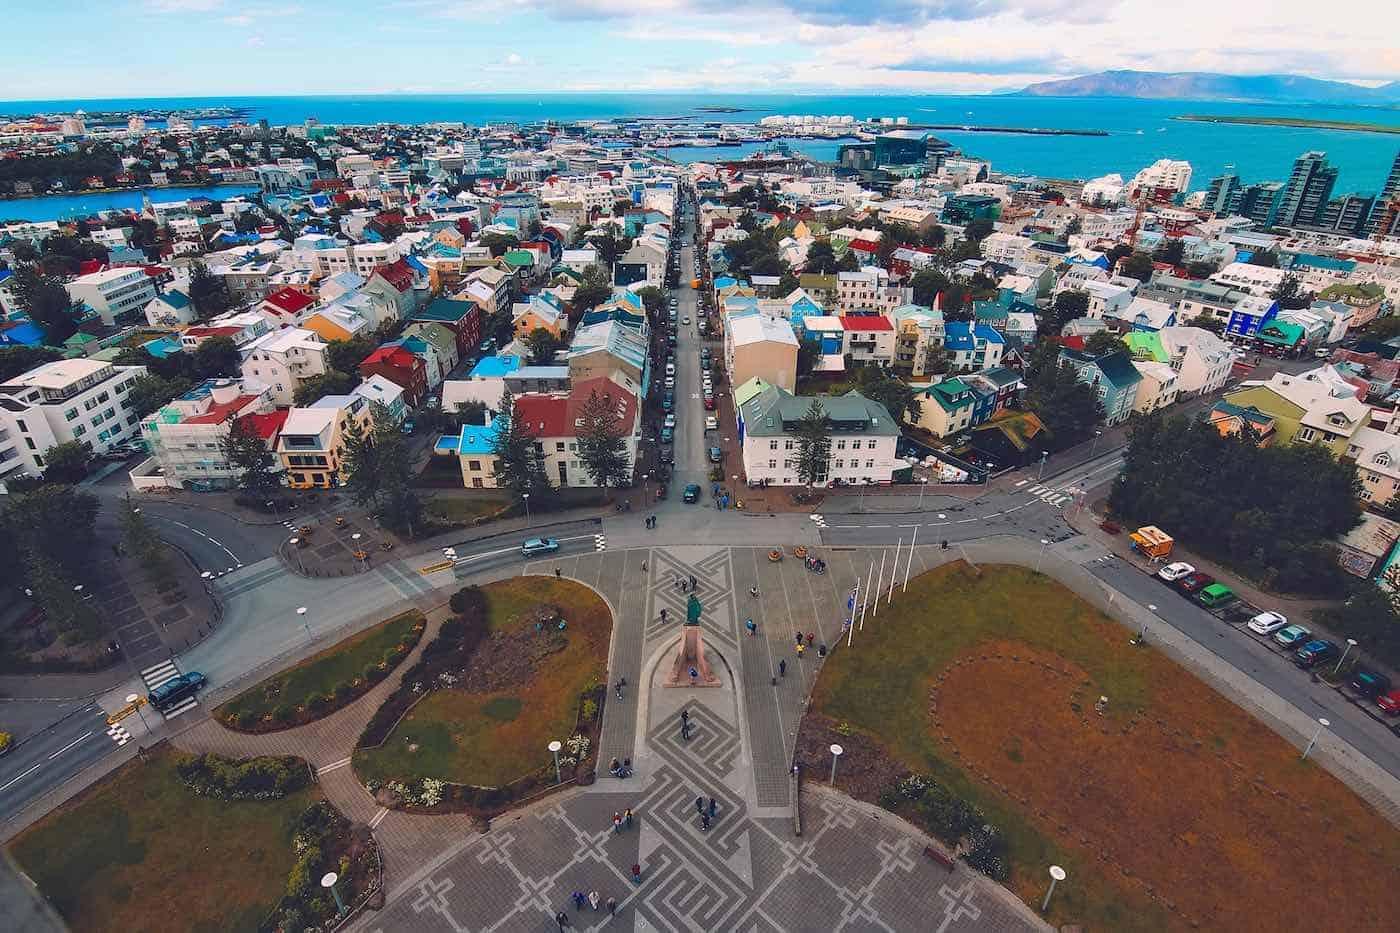 Urban Reykjavík